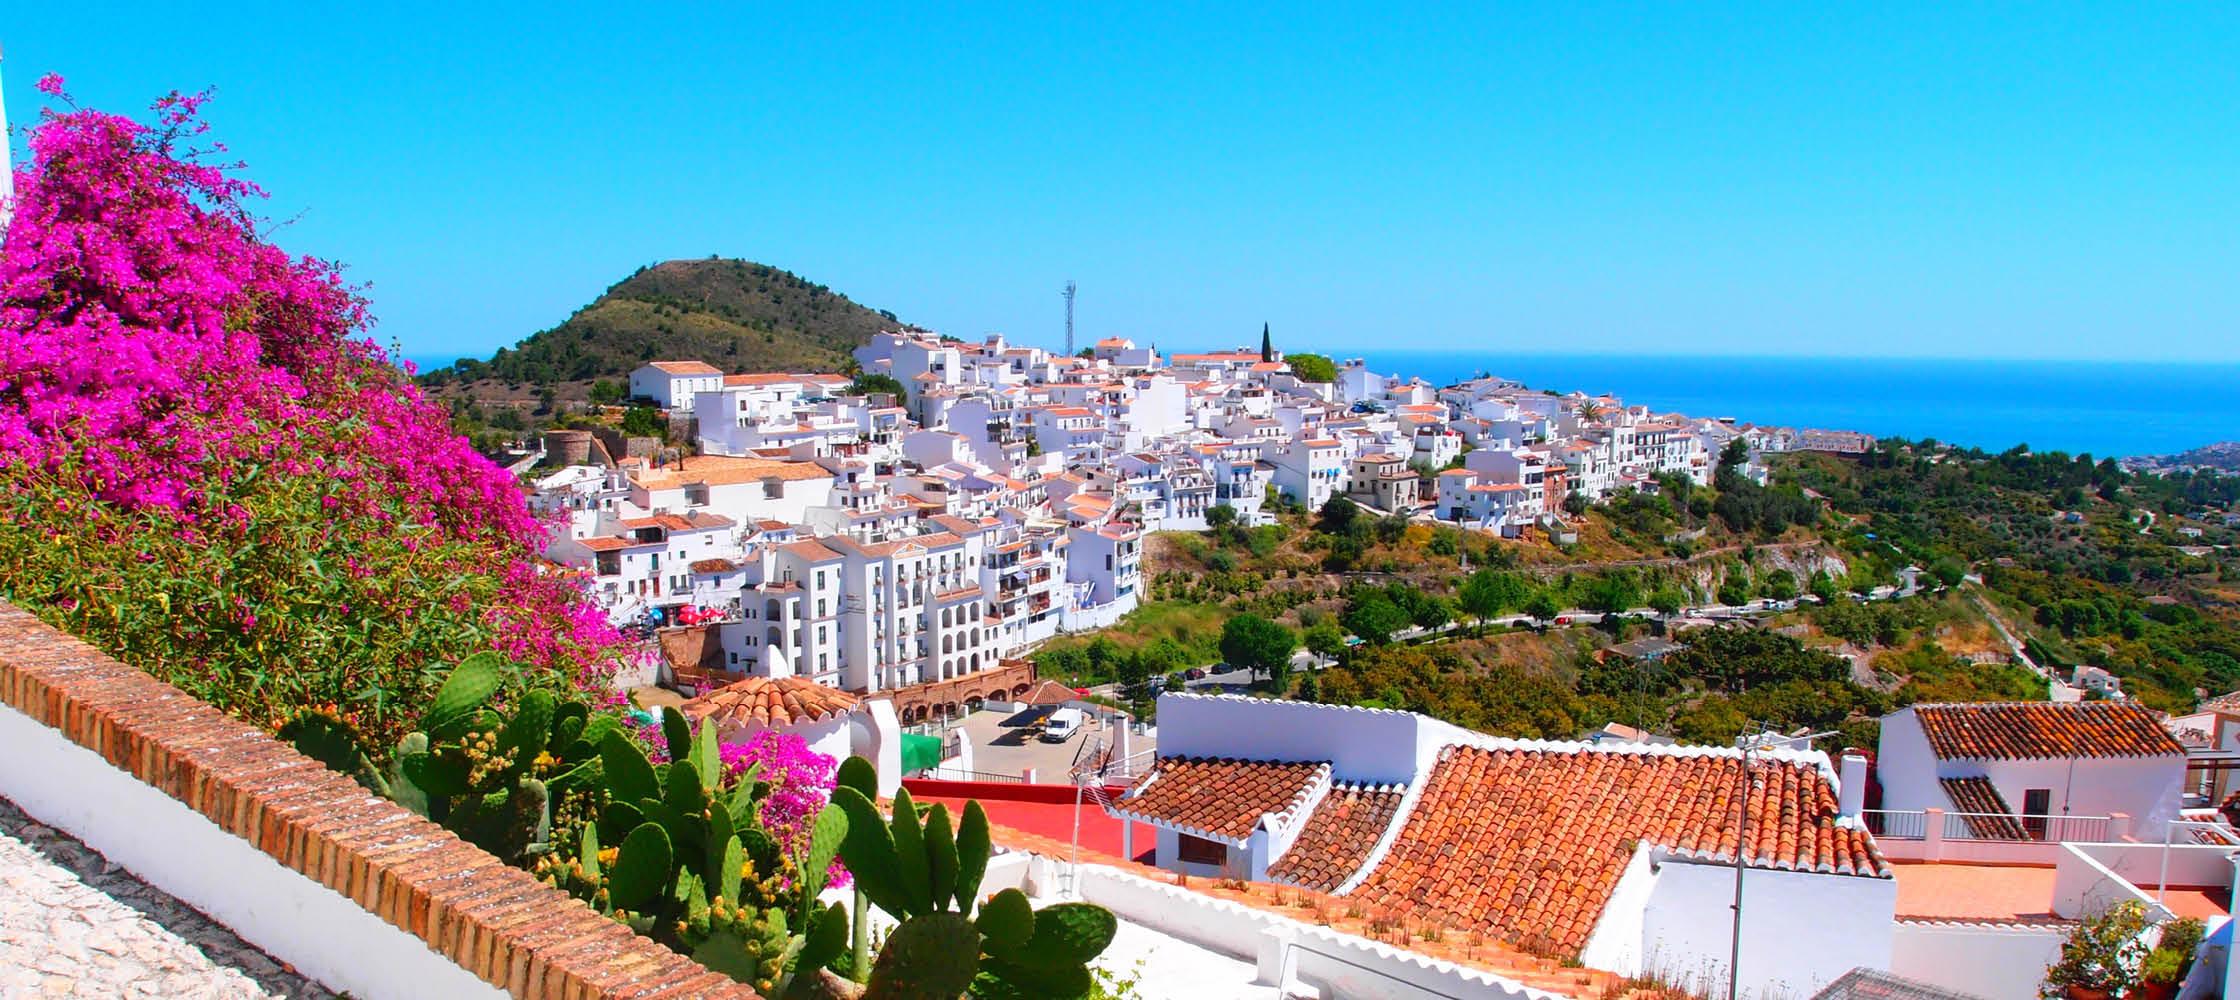 Tag på all-inclusive ferie til Andalusien, Spanien